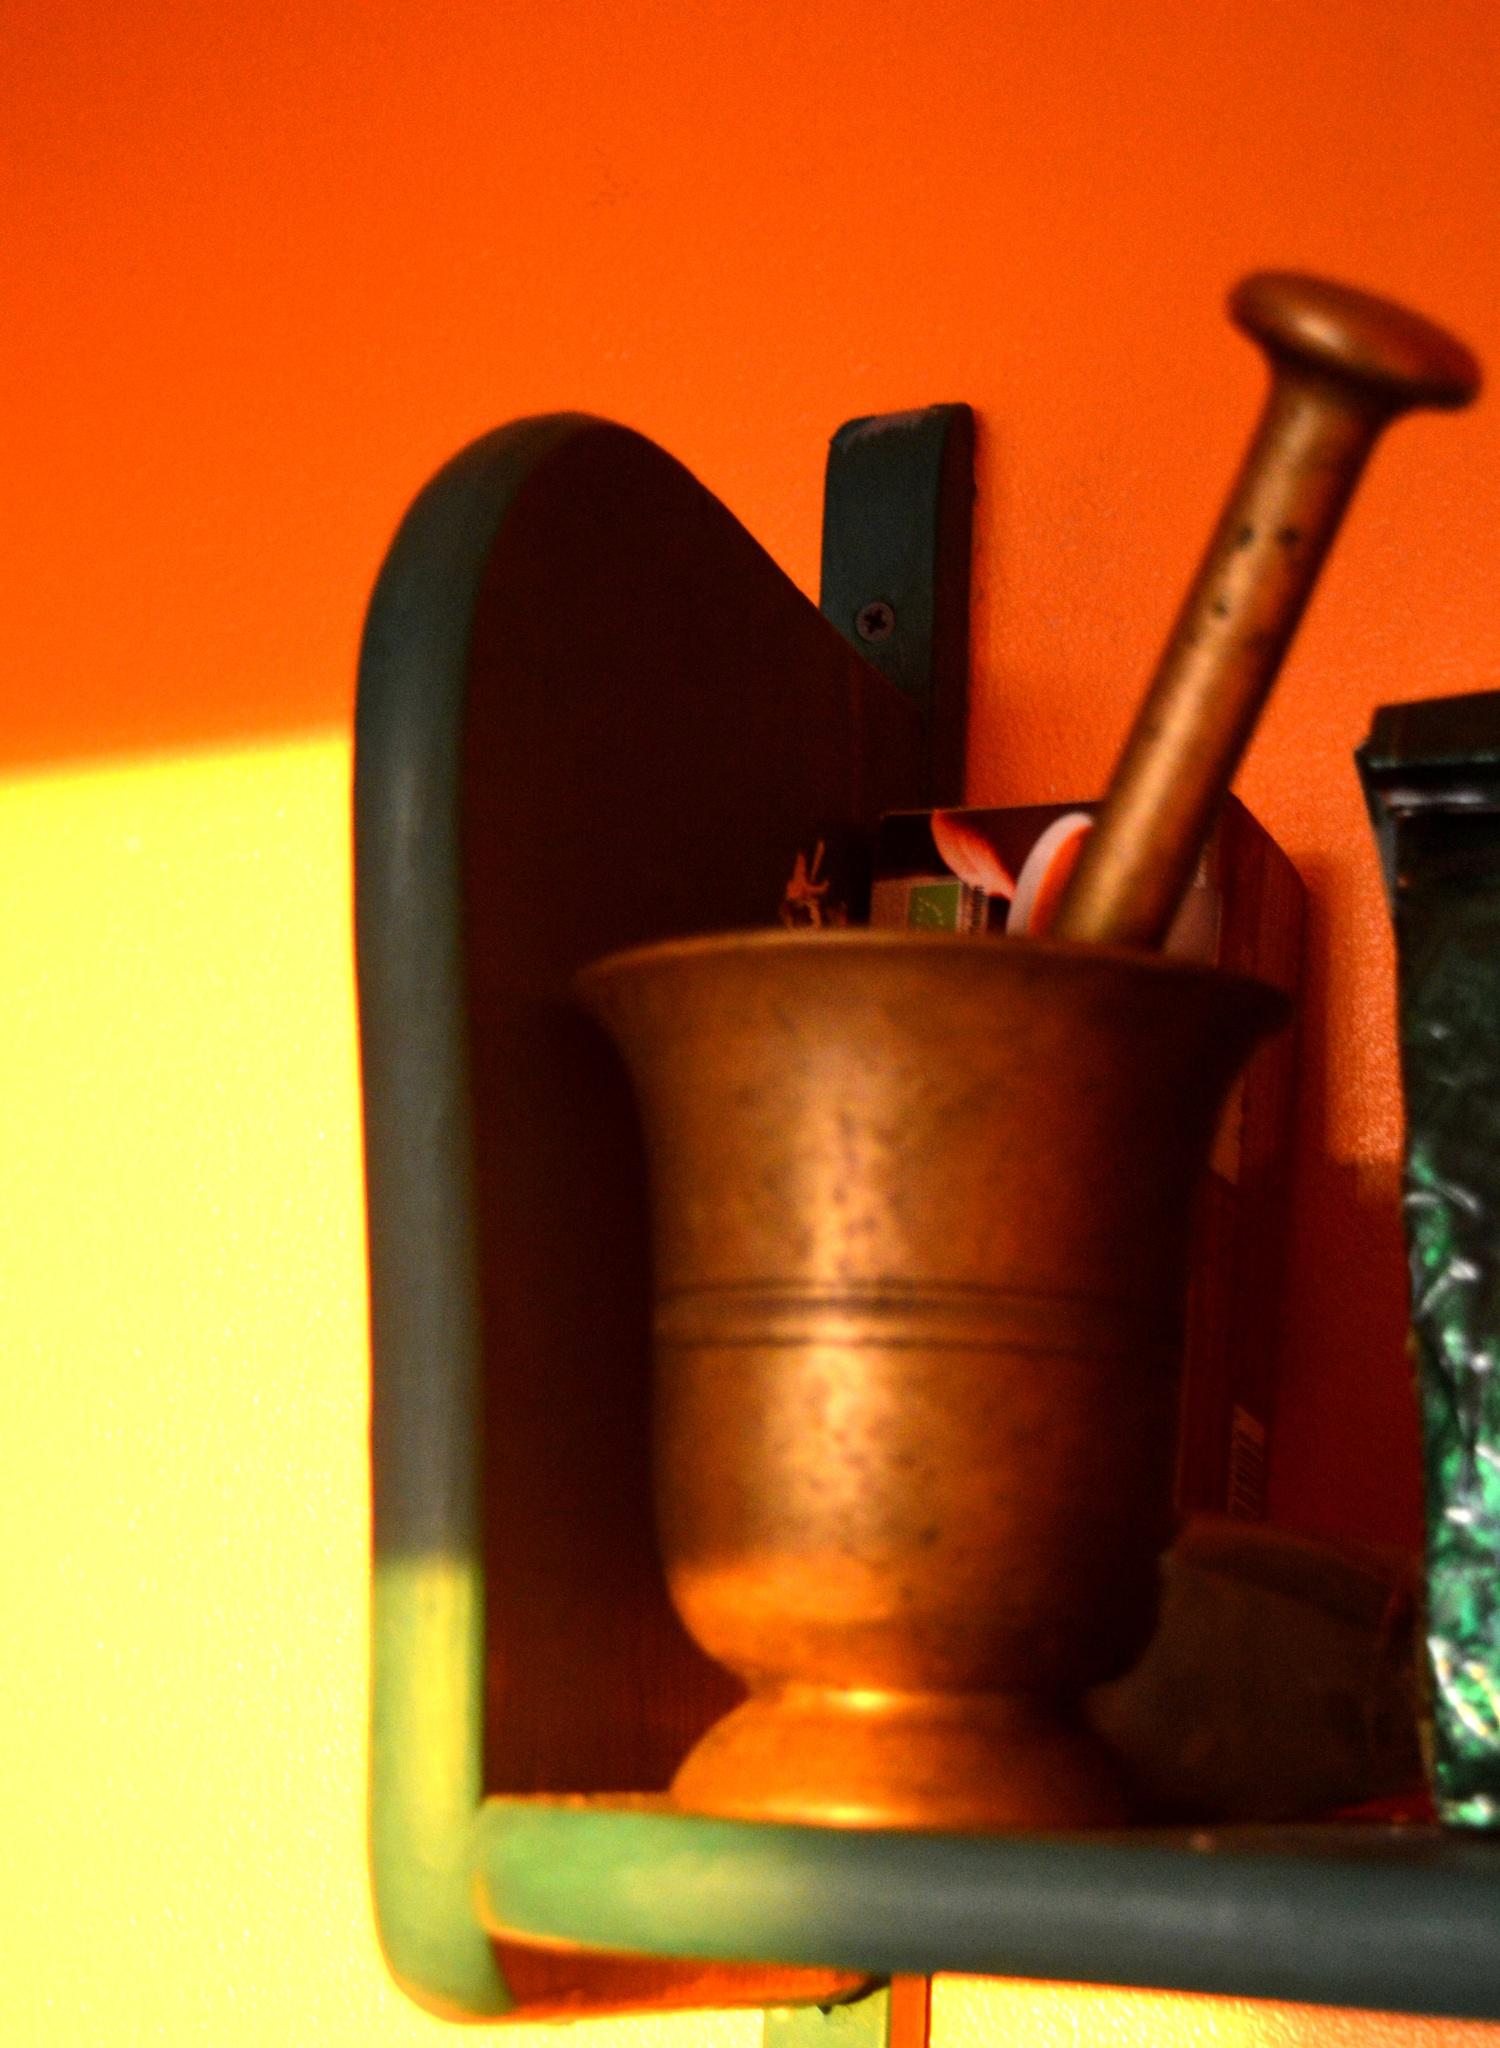 In my kitcshen by Tea-mari Brax